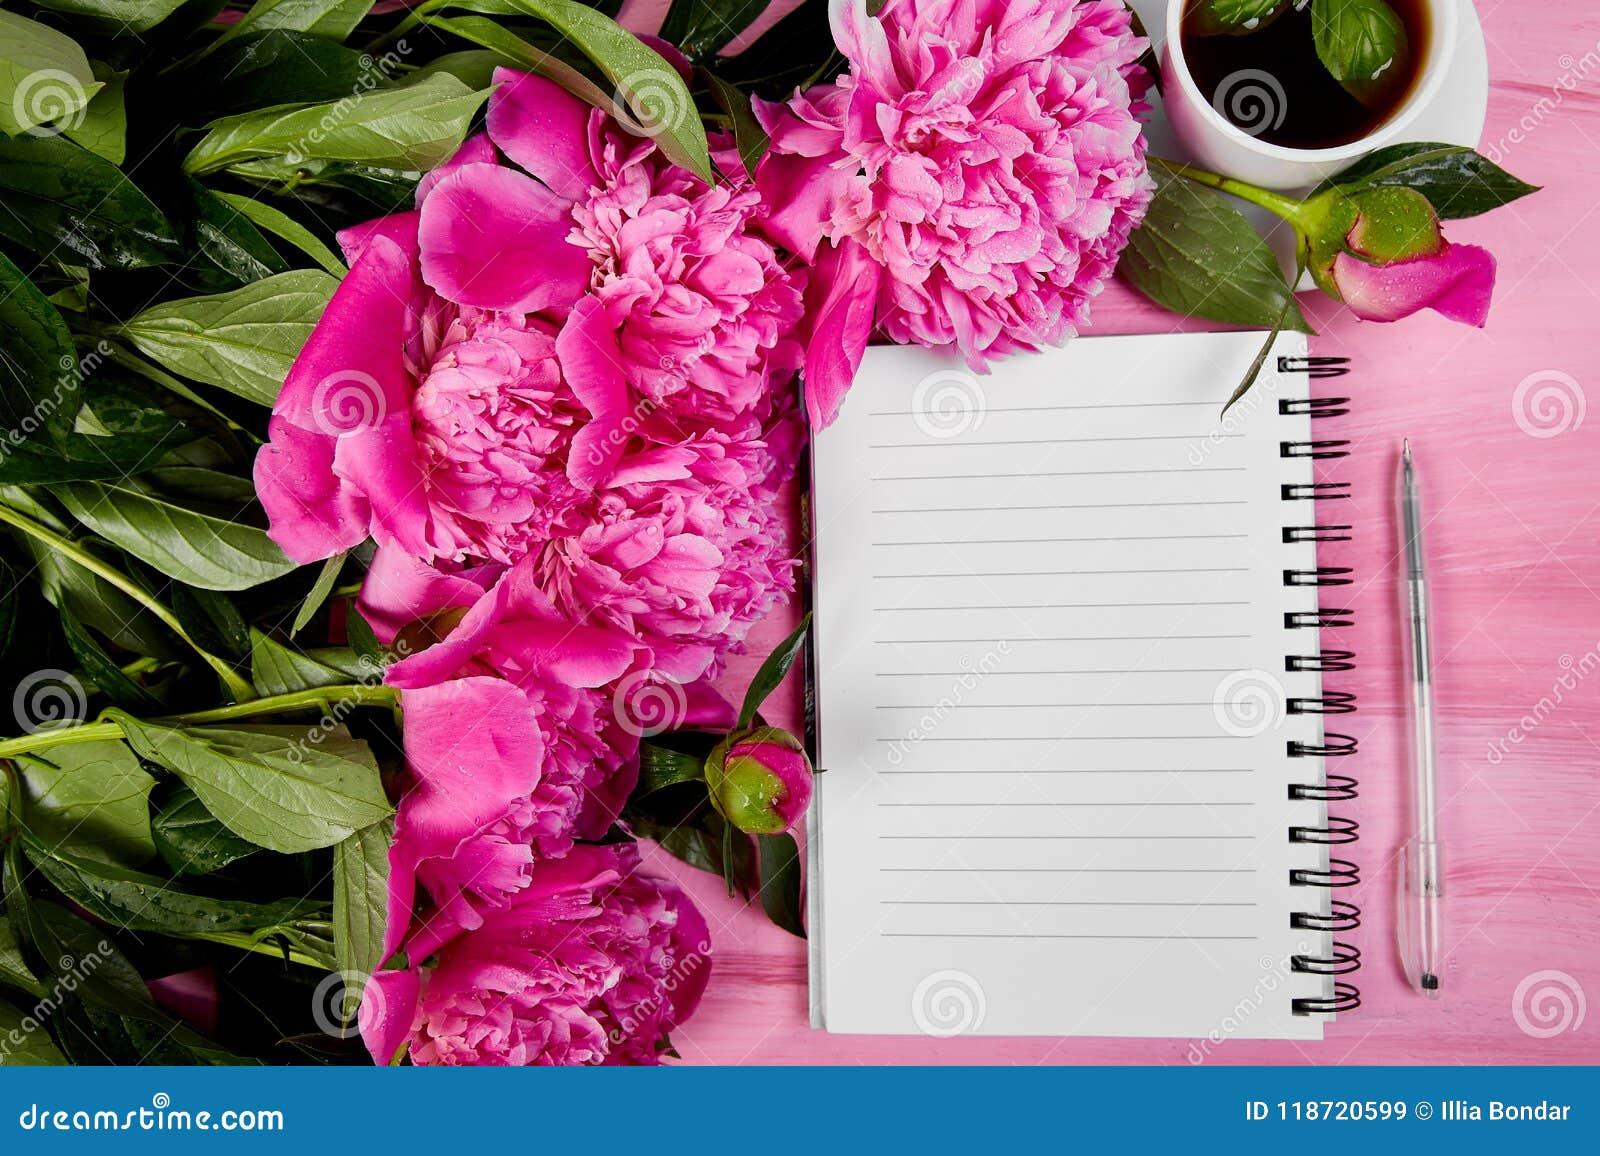 Beautiful pink peony flowers with note stock image image of beautiful pink peony flowers with note mightylinksfo